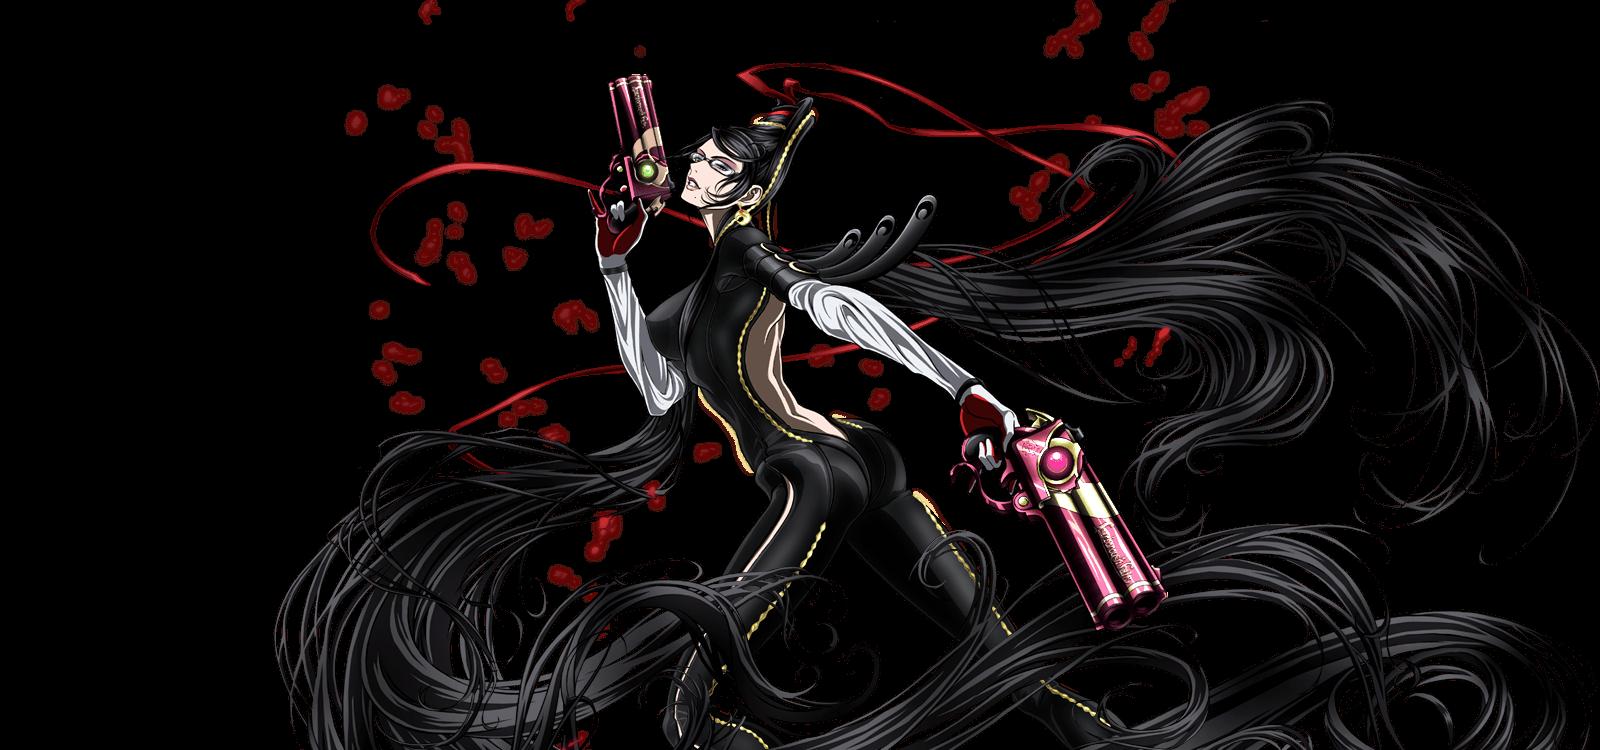 Bayonetta Bloody Fate Anime Movie Announced The Shinigami List